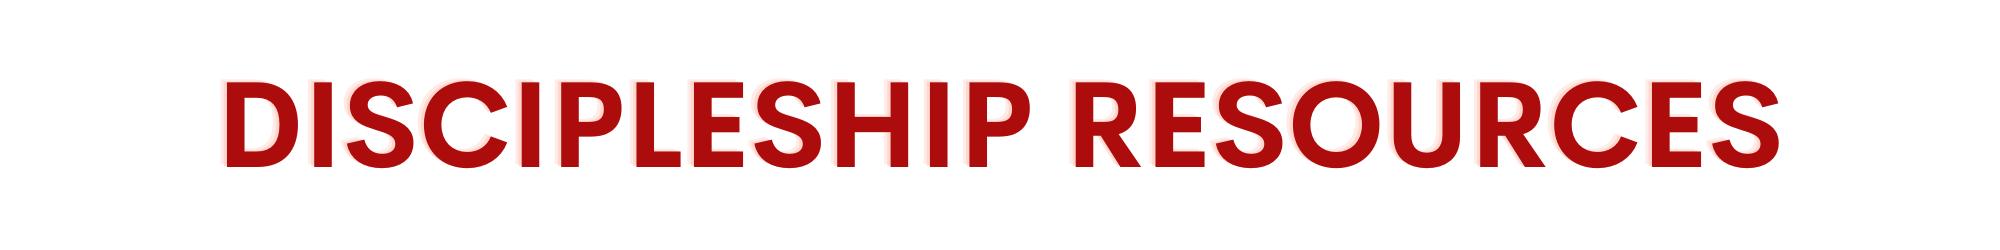 Discipleship Resources